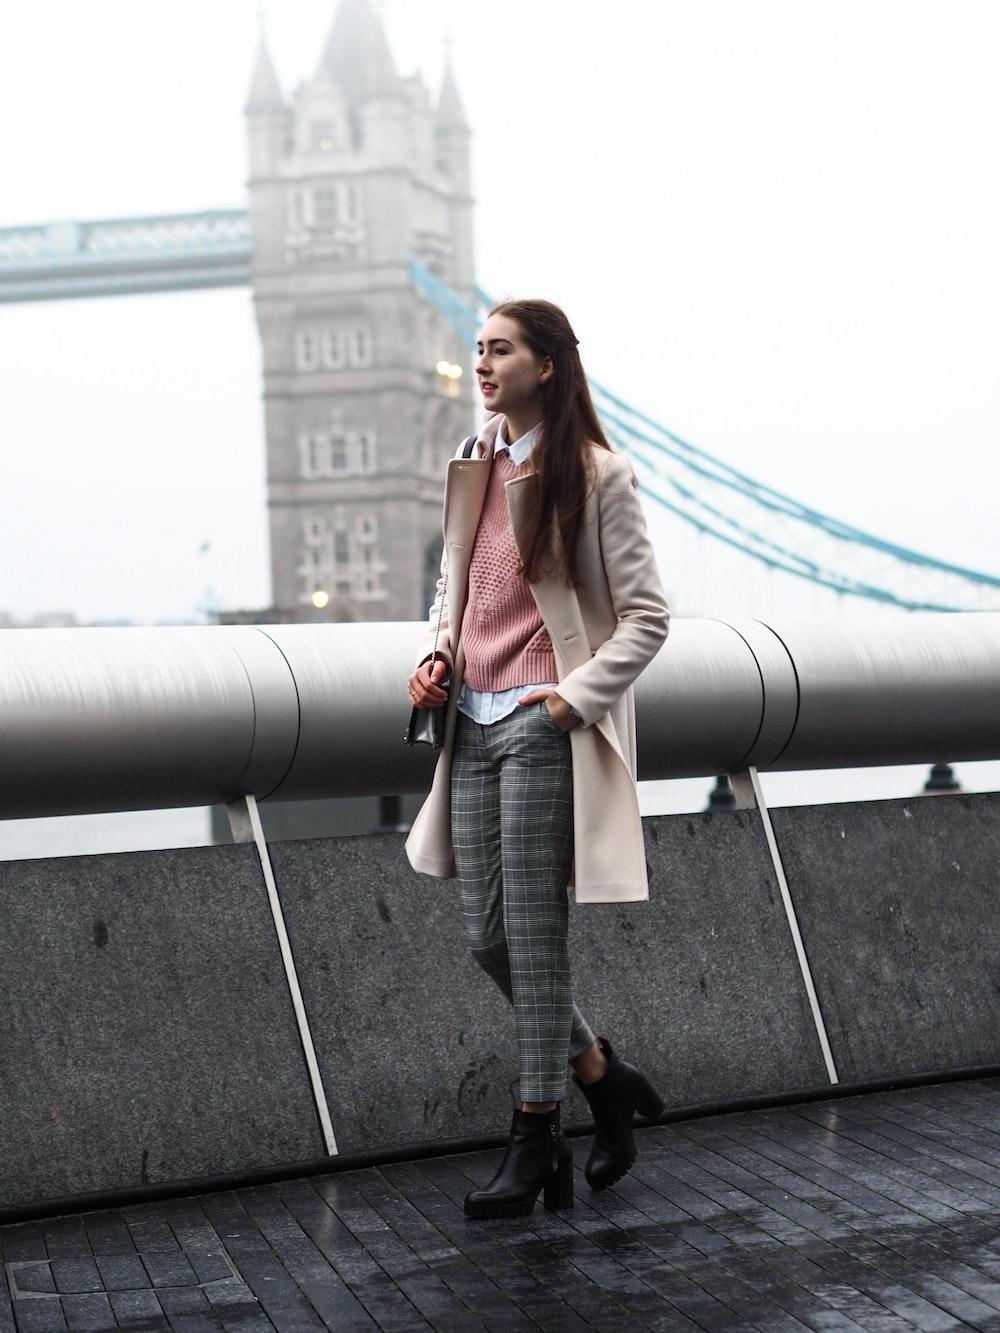 woman in brown overcoat near Tower Bridge